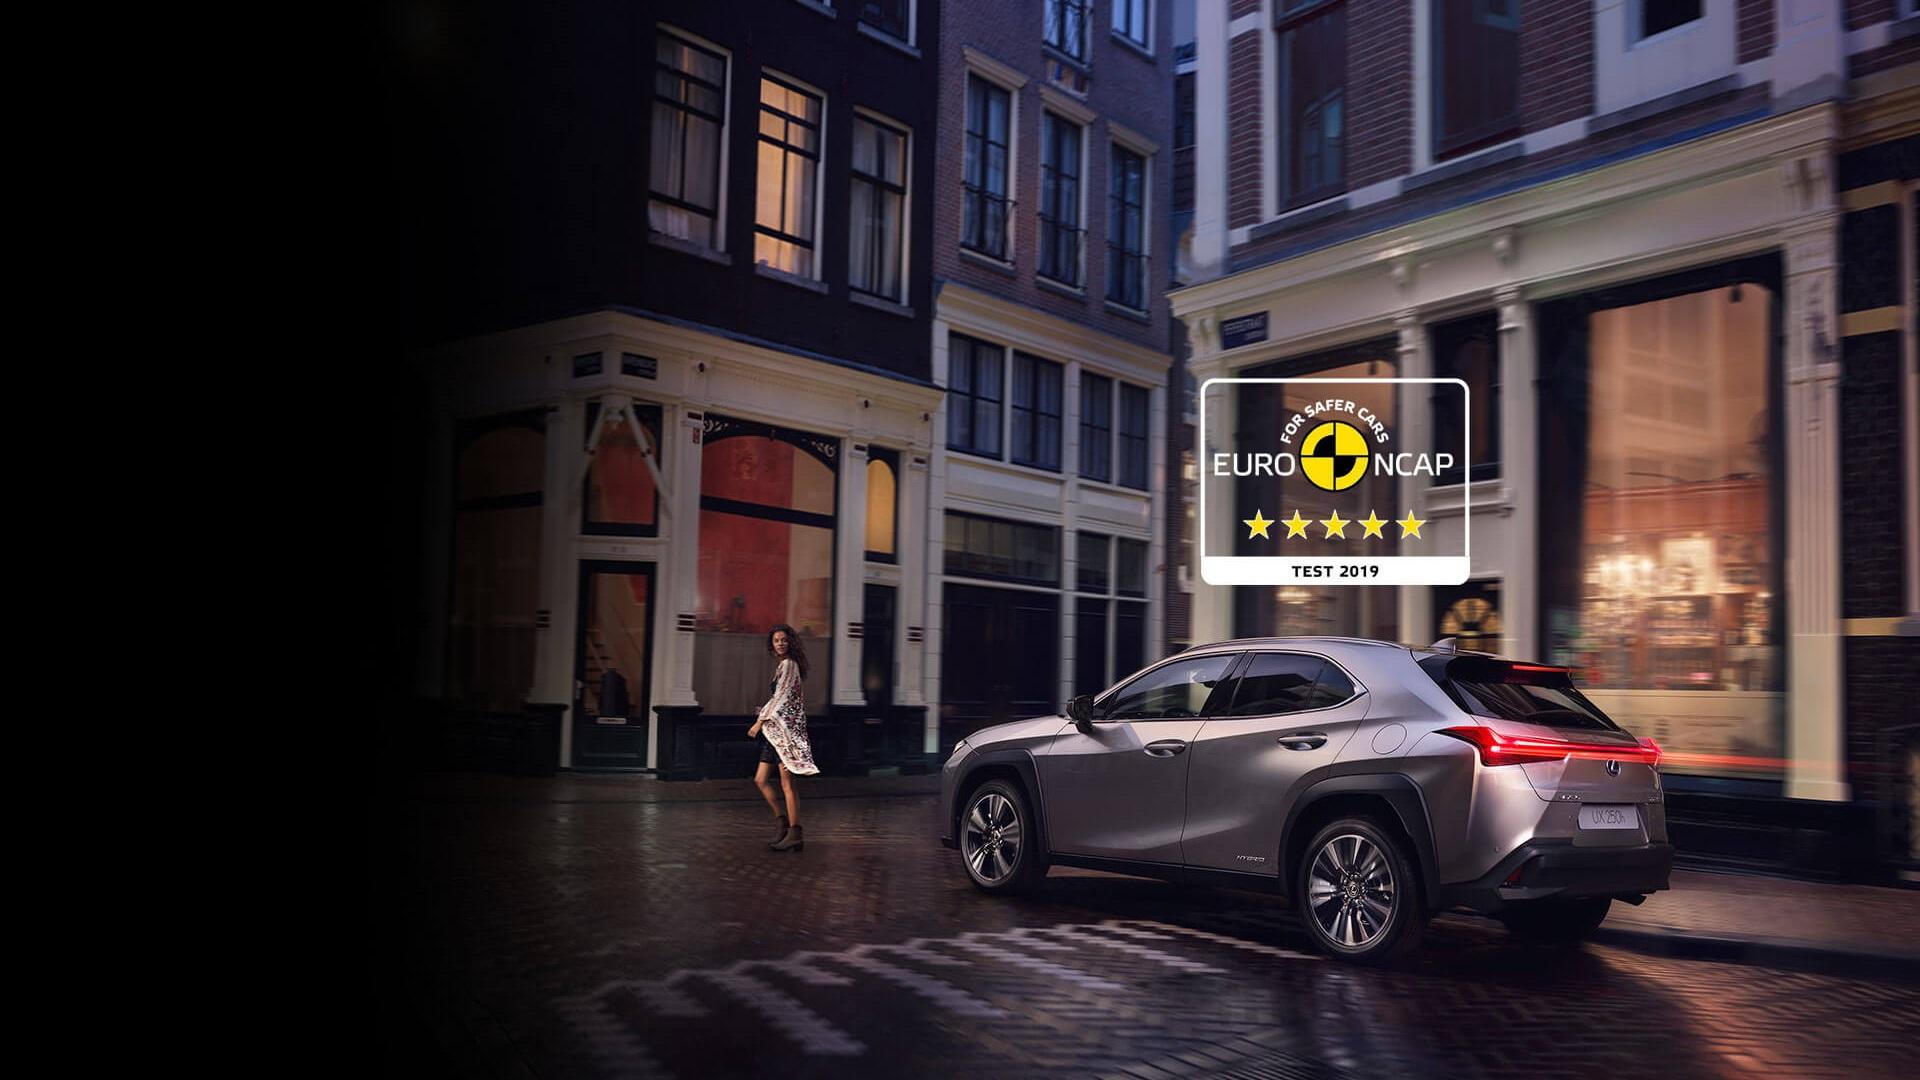 Standard 2019 lexus eu ux safety euro ncap 1920x1080 tcm 3158 1677458